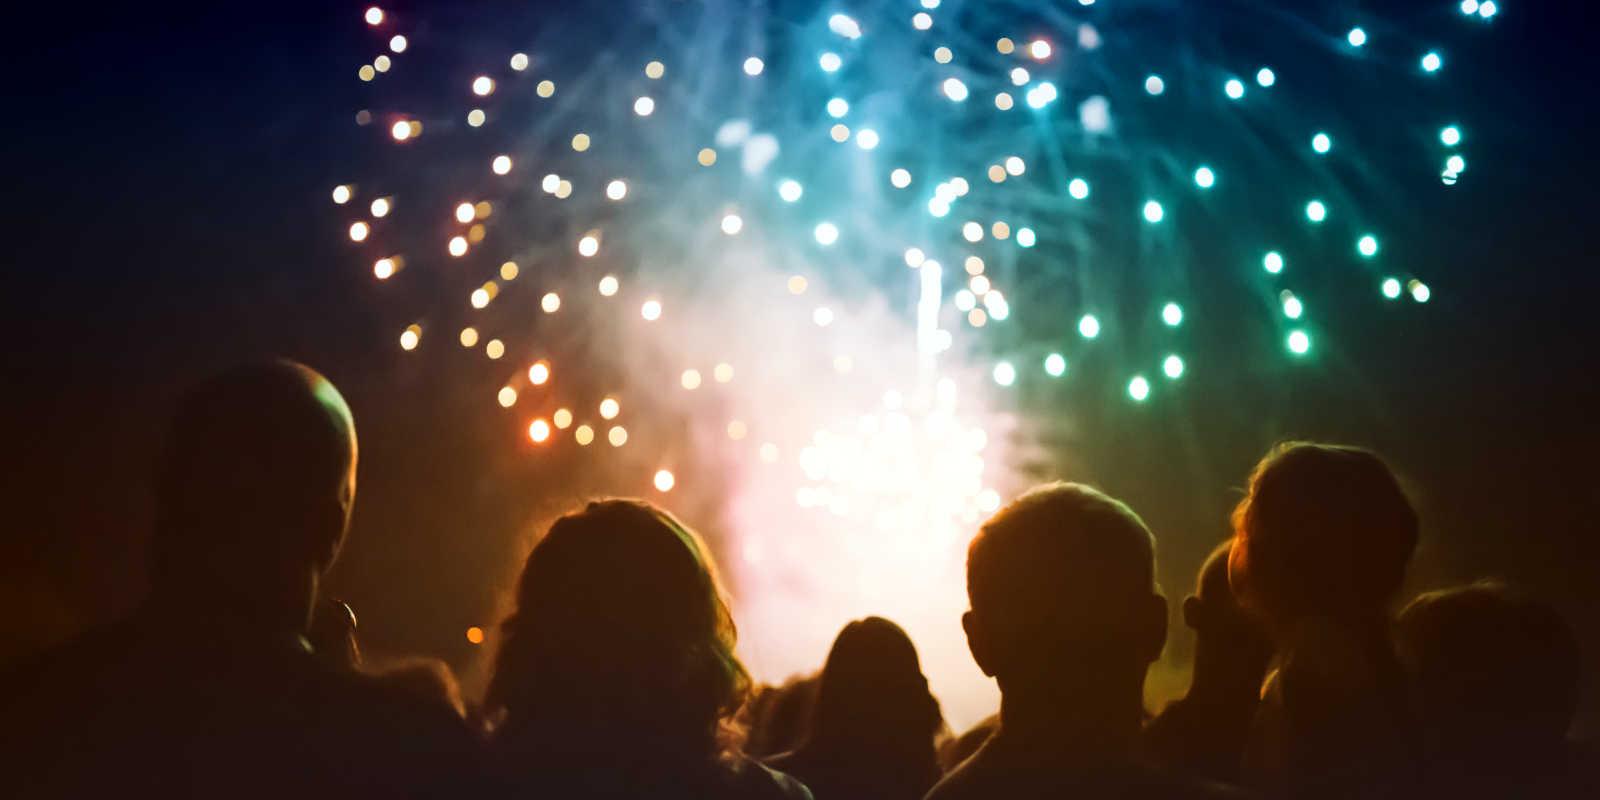 People watching fireworks on Bonfire Night